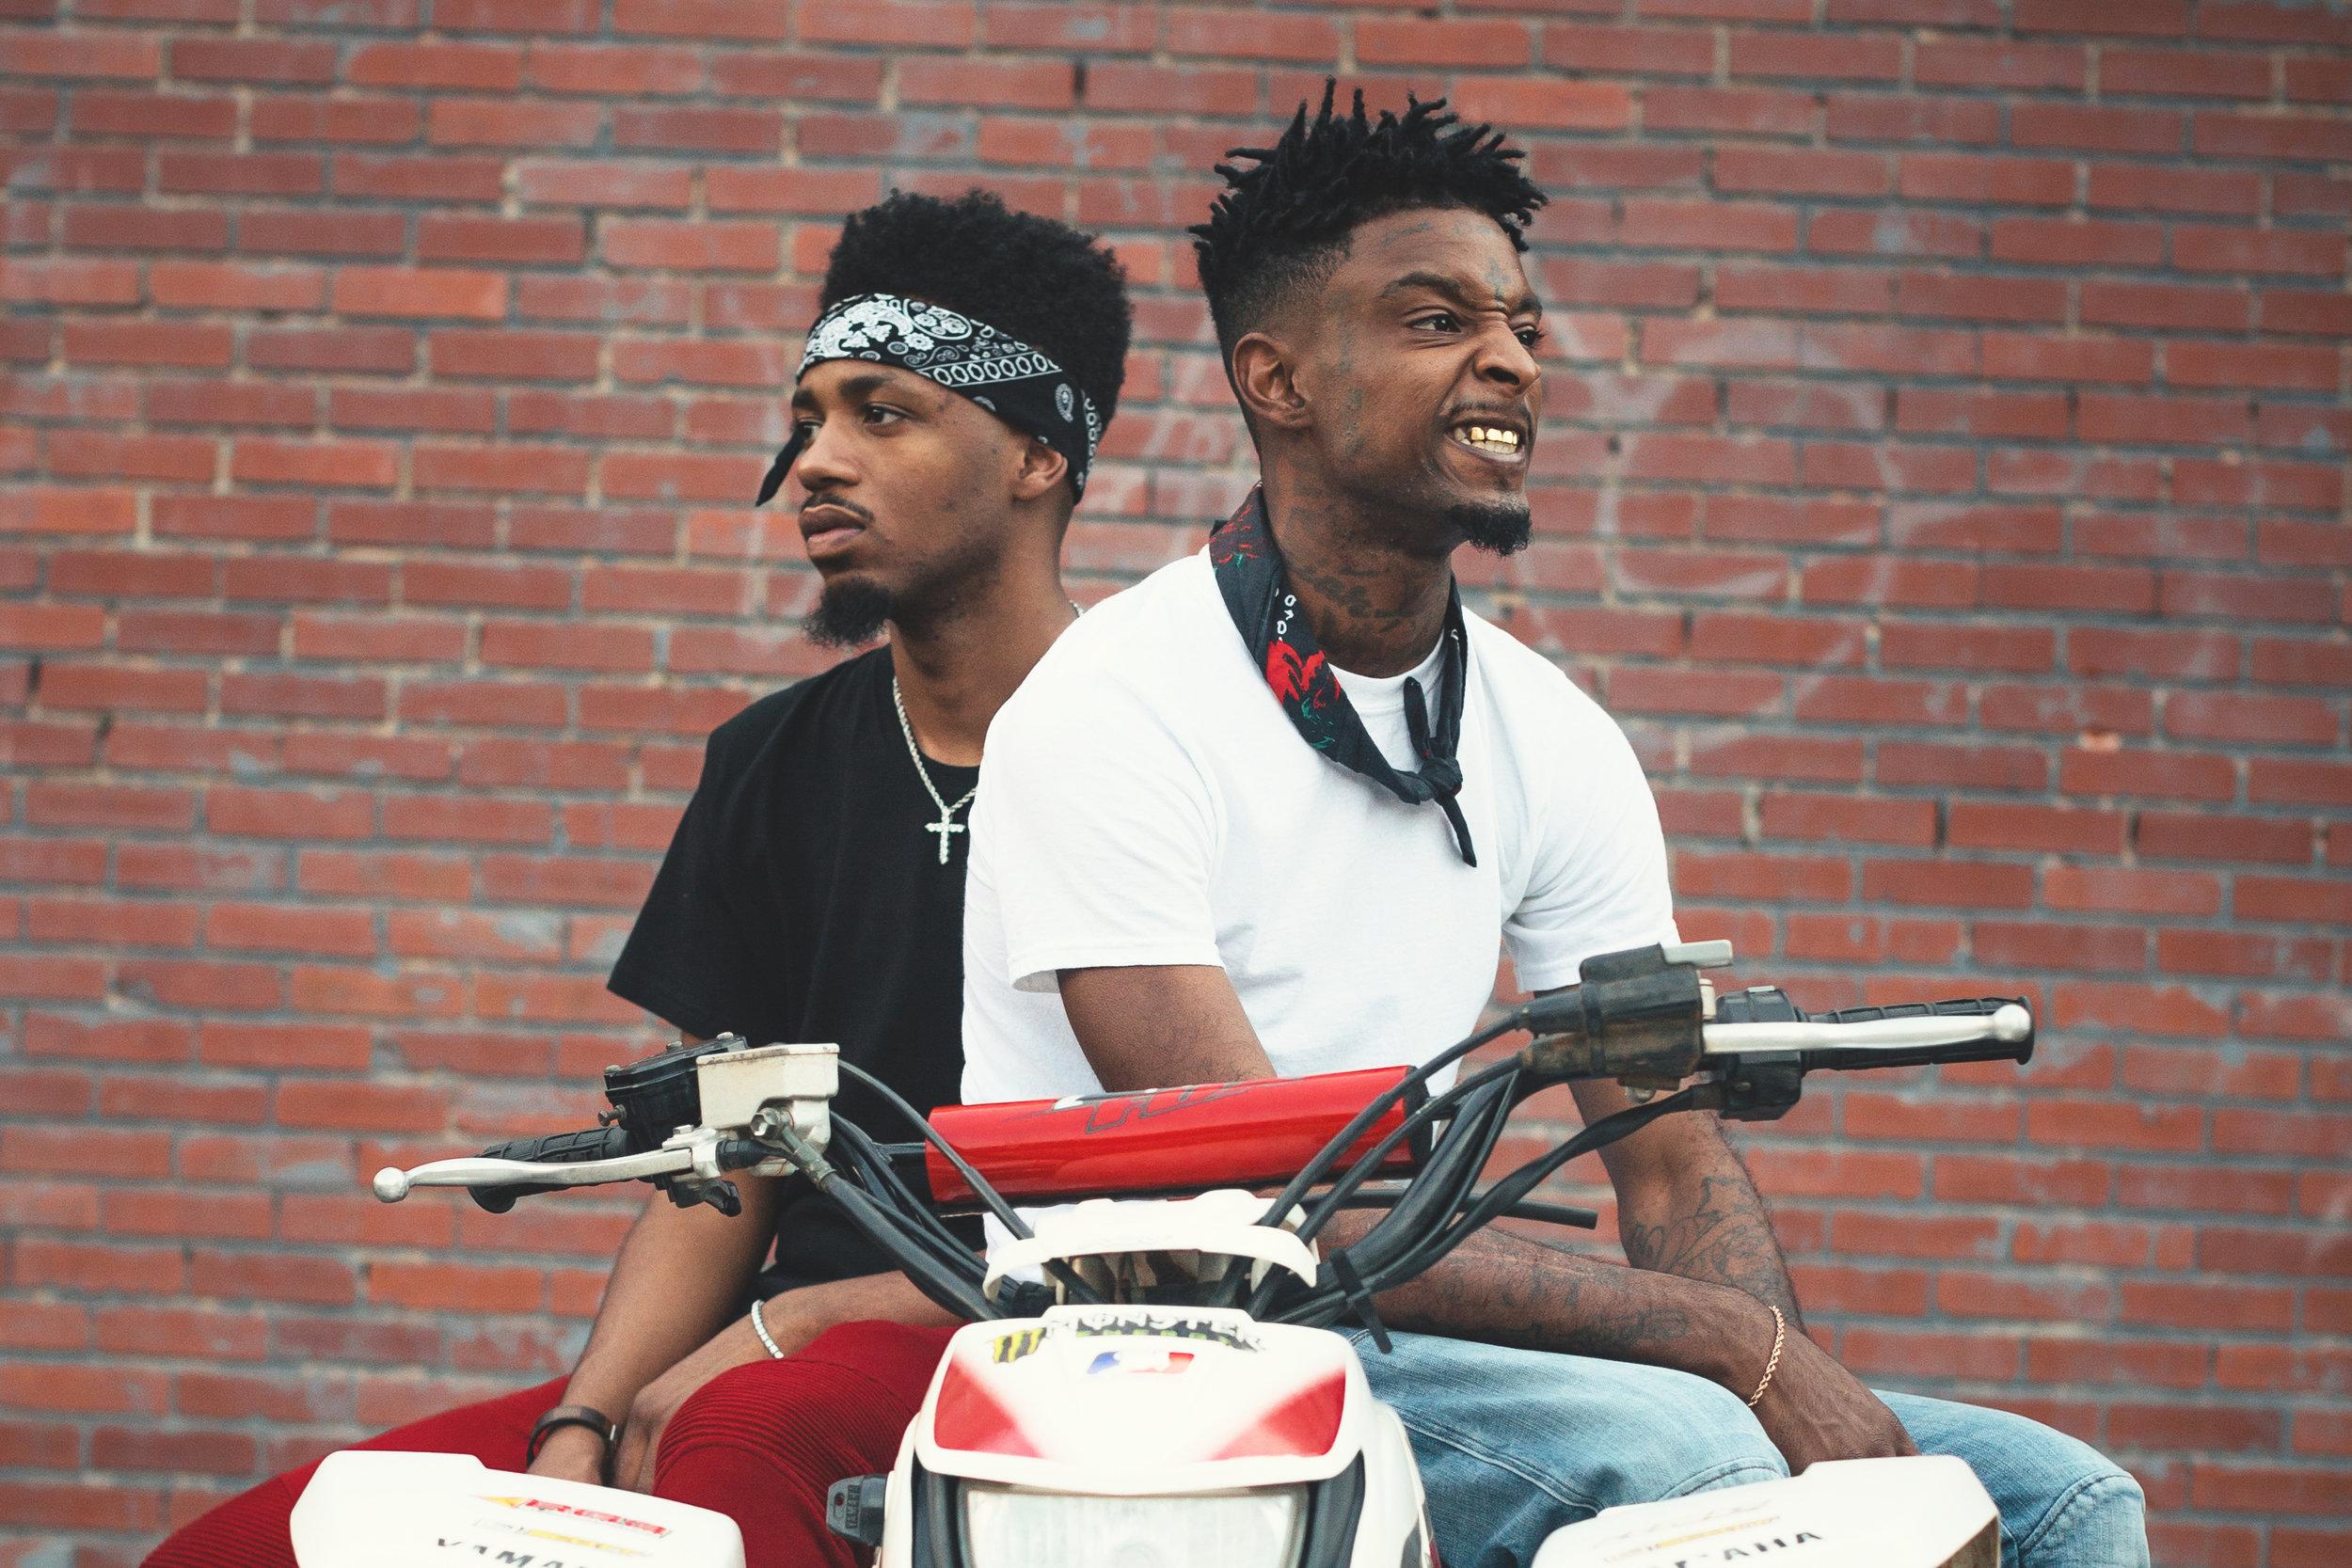 Metro Boomin, 21 Savage, Atlanta 2016